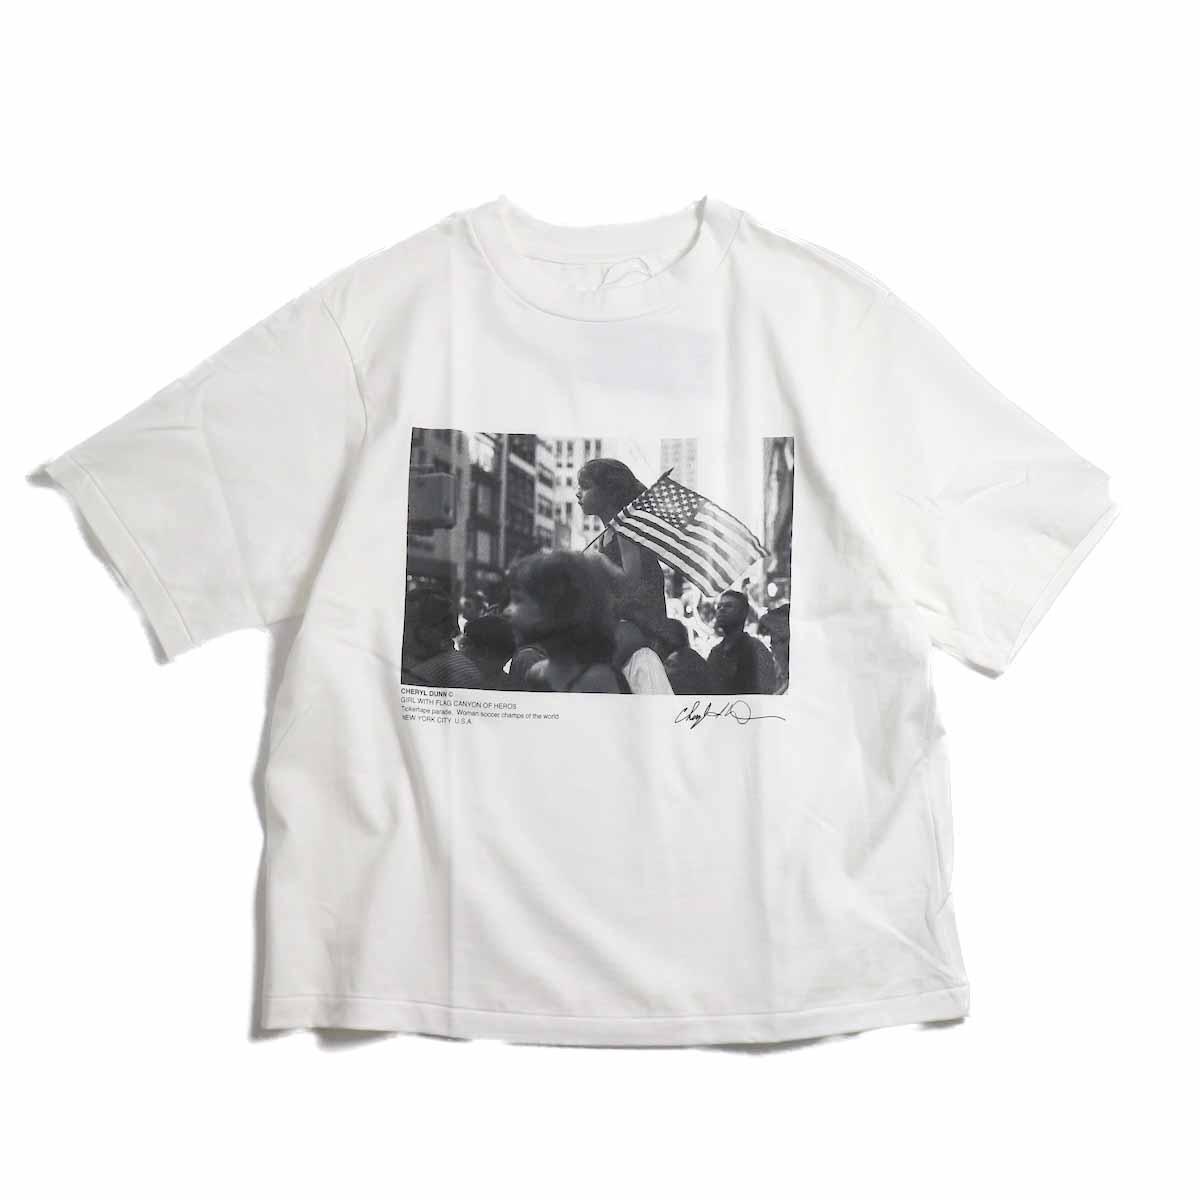 JANE SMITH / Cheryl Dunn Girl With Flag Canyon Of Heros Short Sleeve T-Shirt -White